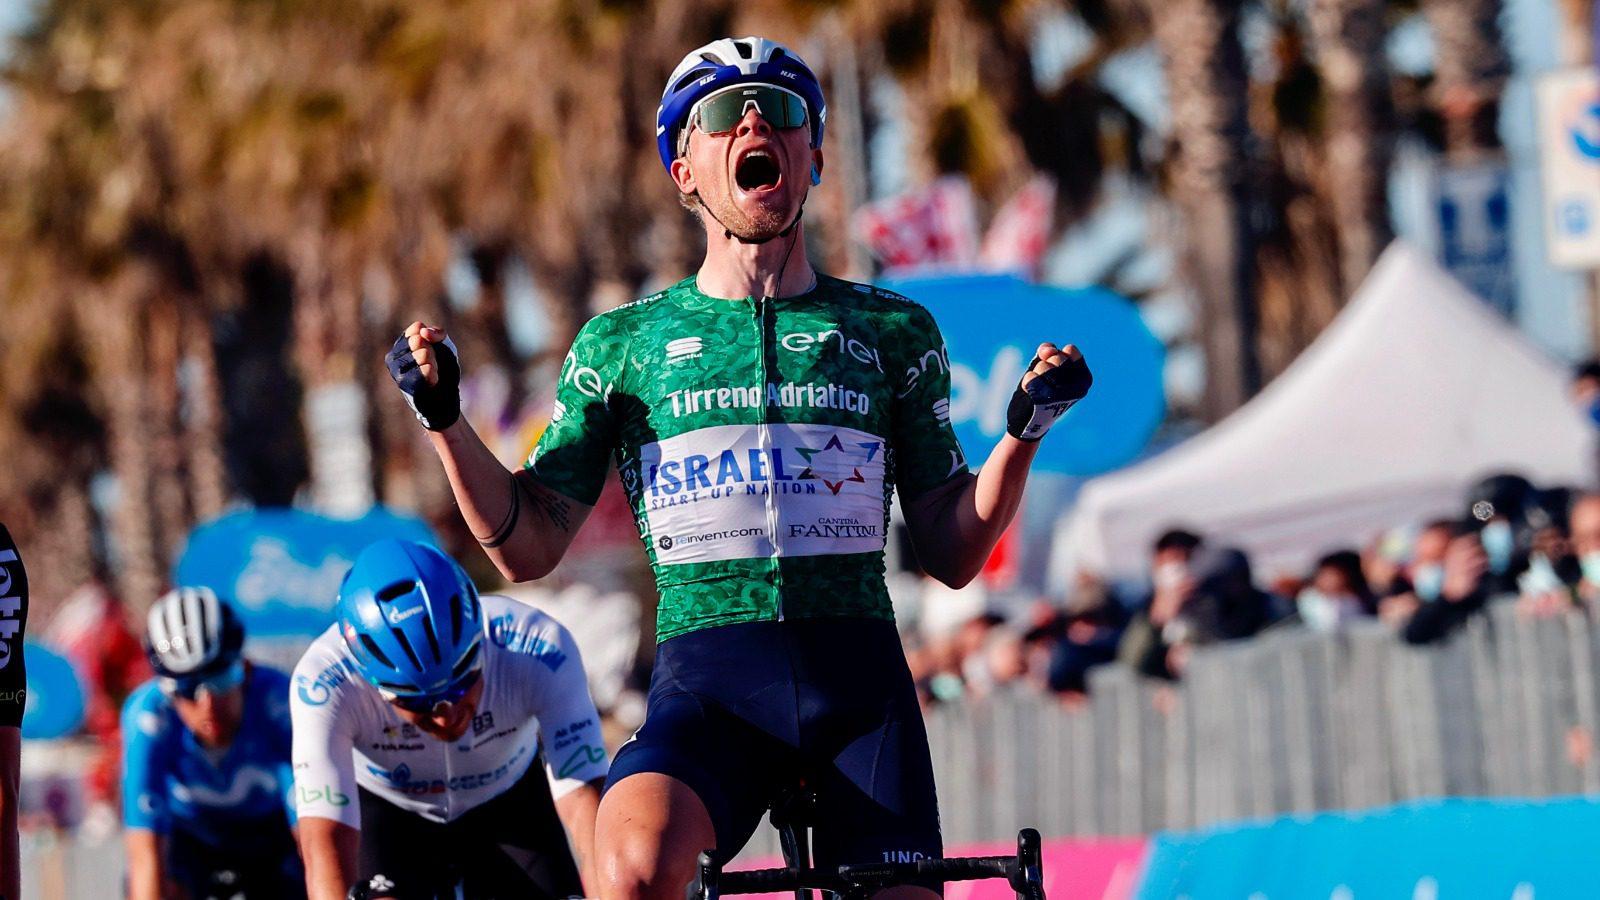 VIDEO: MAXIMUM MADS – Würtz wins stage 6 Tirreno-Adriatico 2021